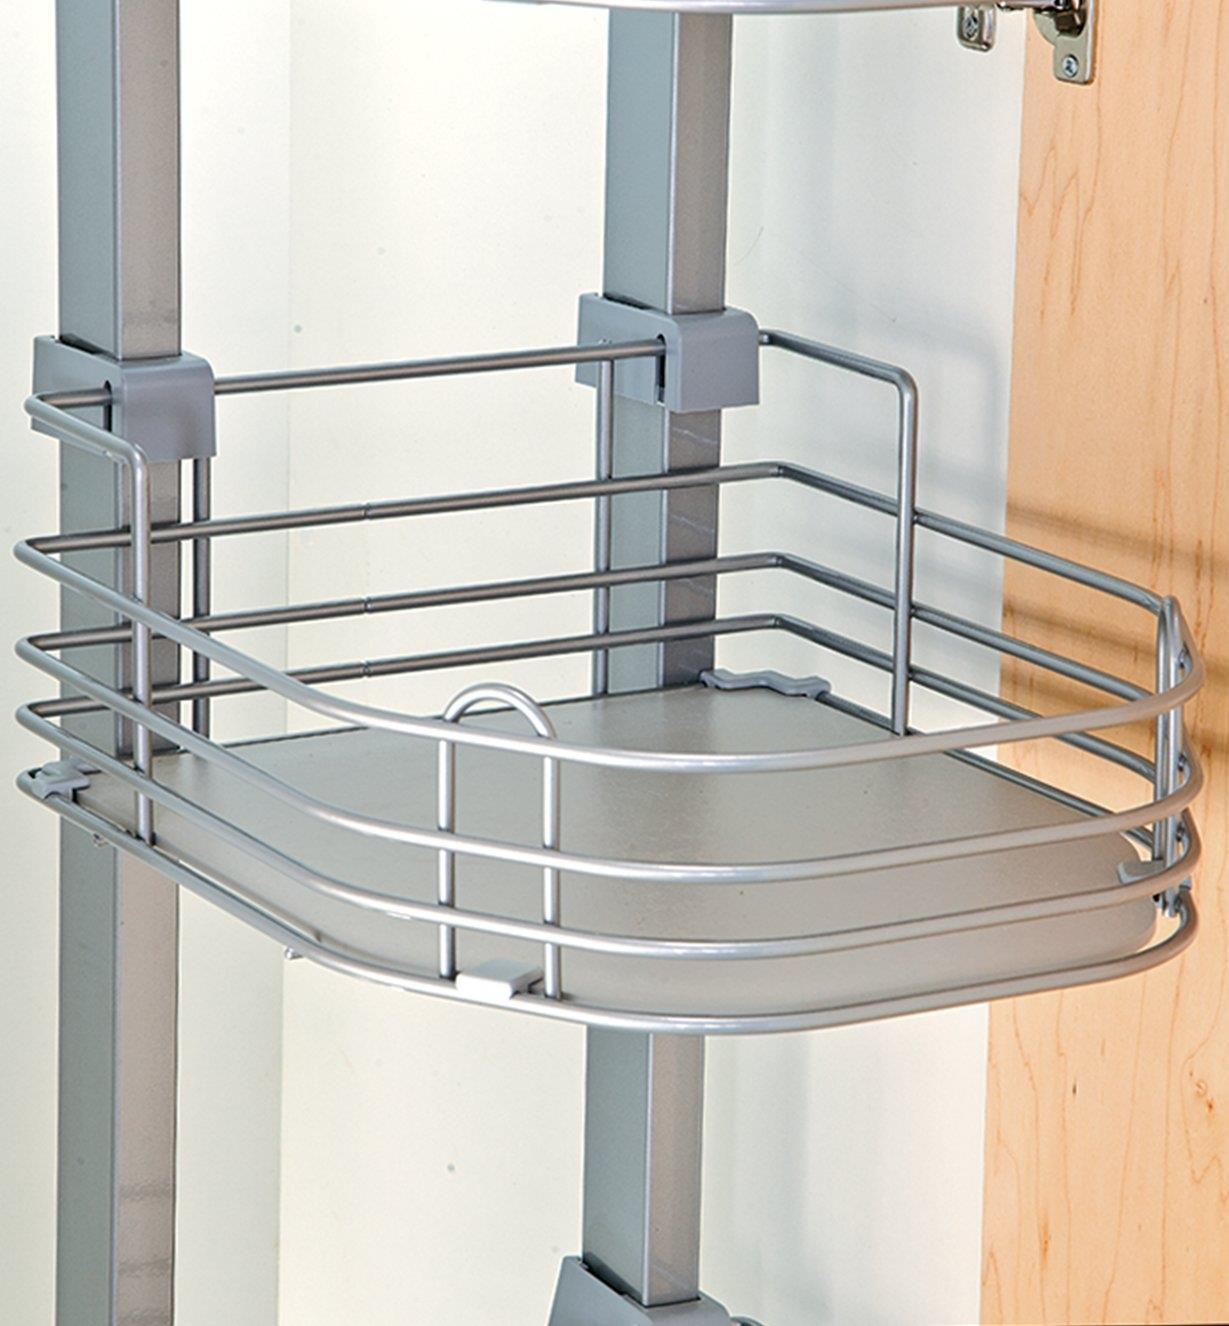 Close-up of pantry unit shelf